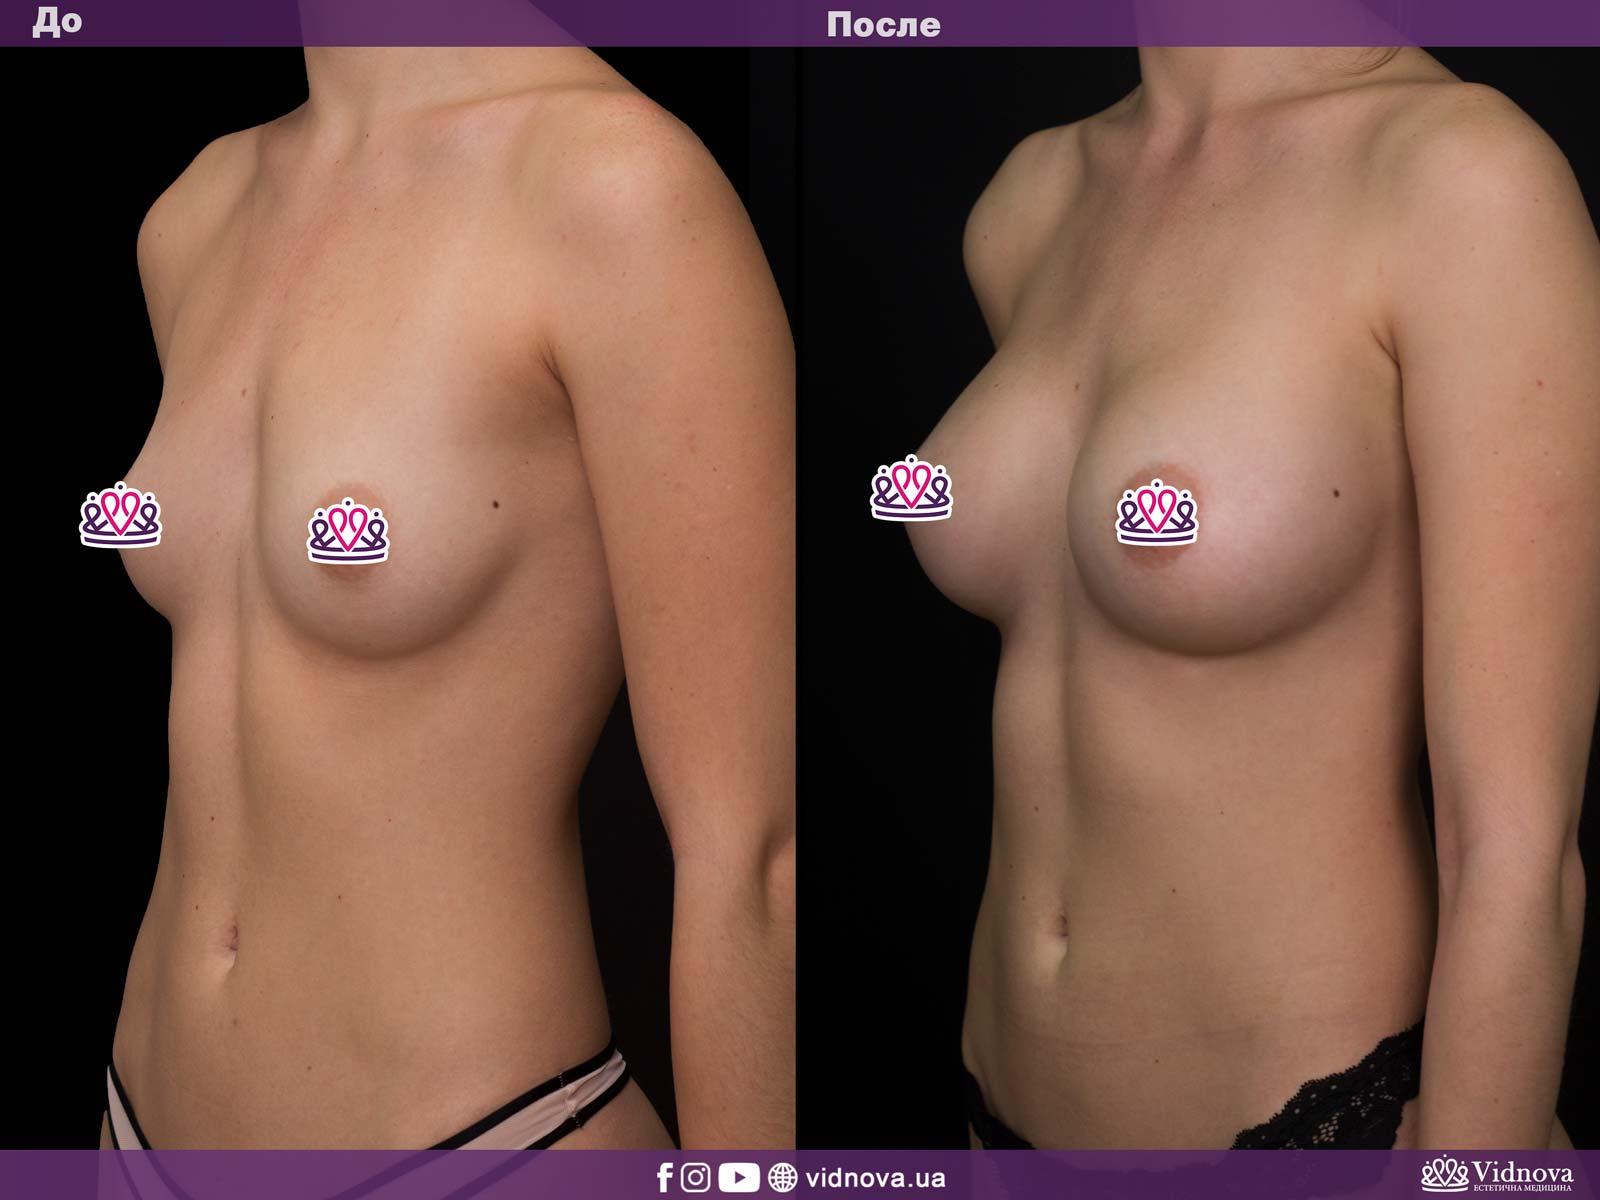 Увеличение груди: Фото ДО и ПОСЛЕ - Пример №3-2 - Клиника Vidnova